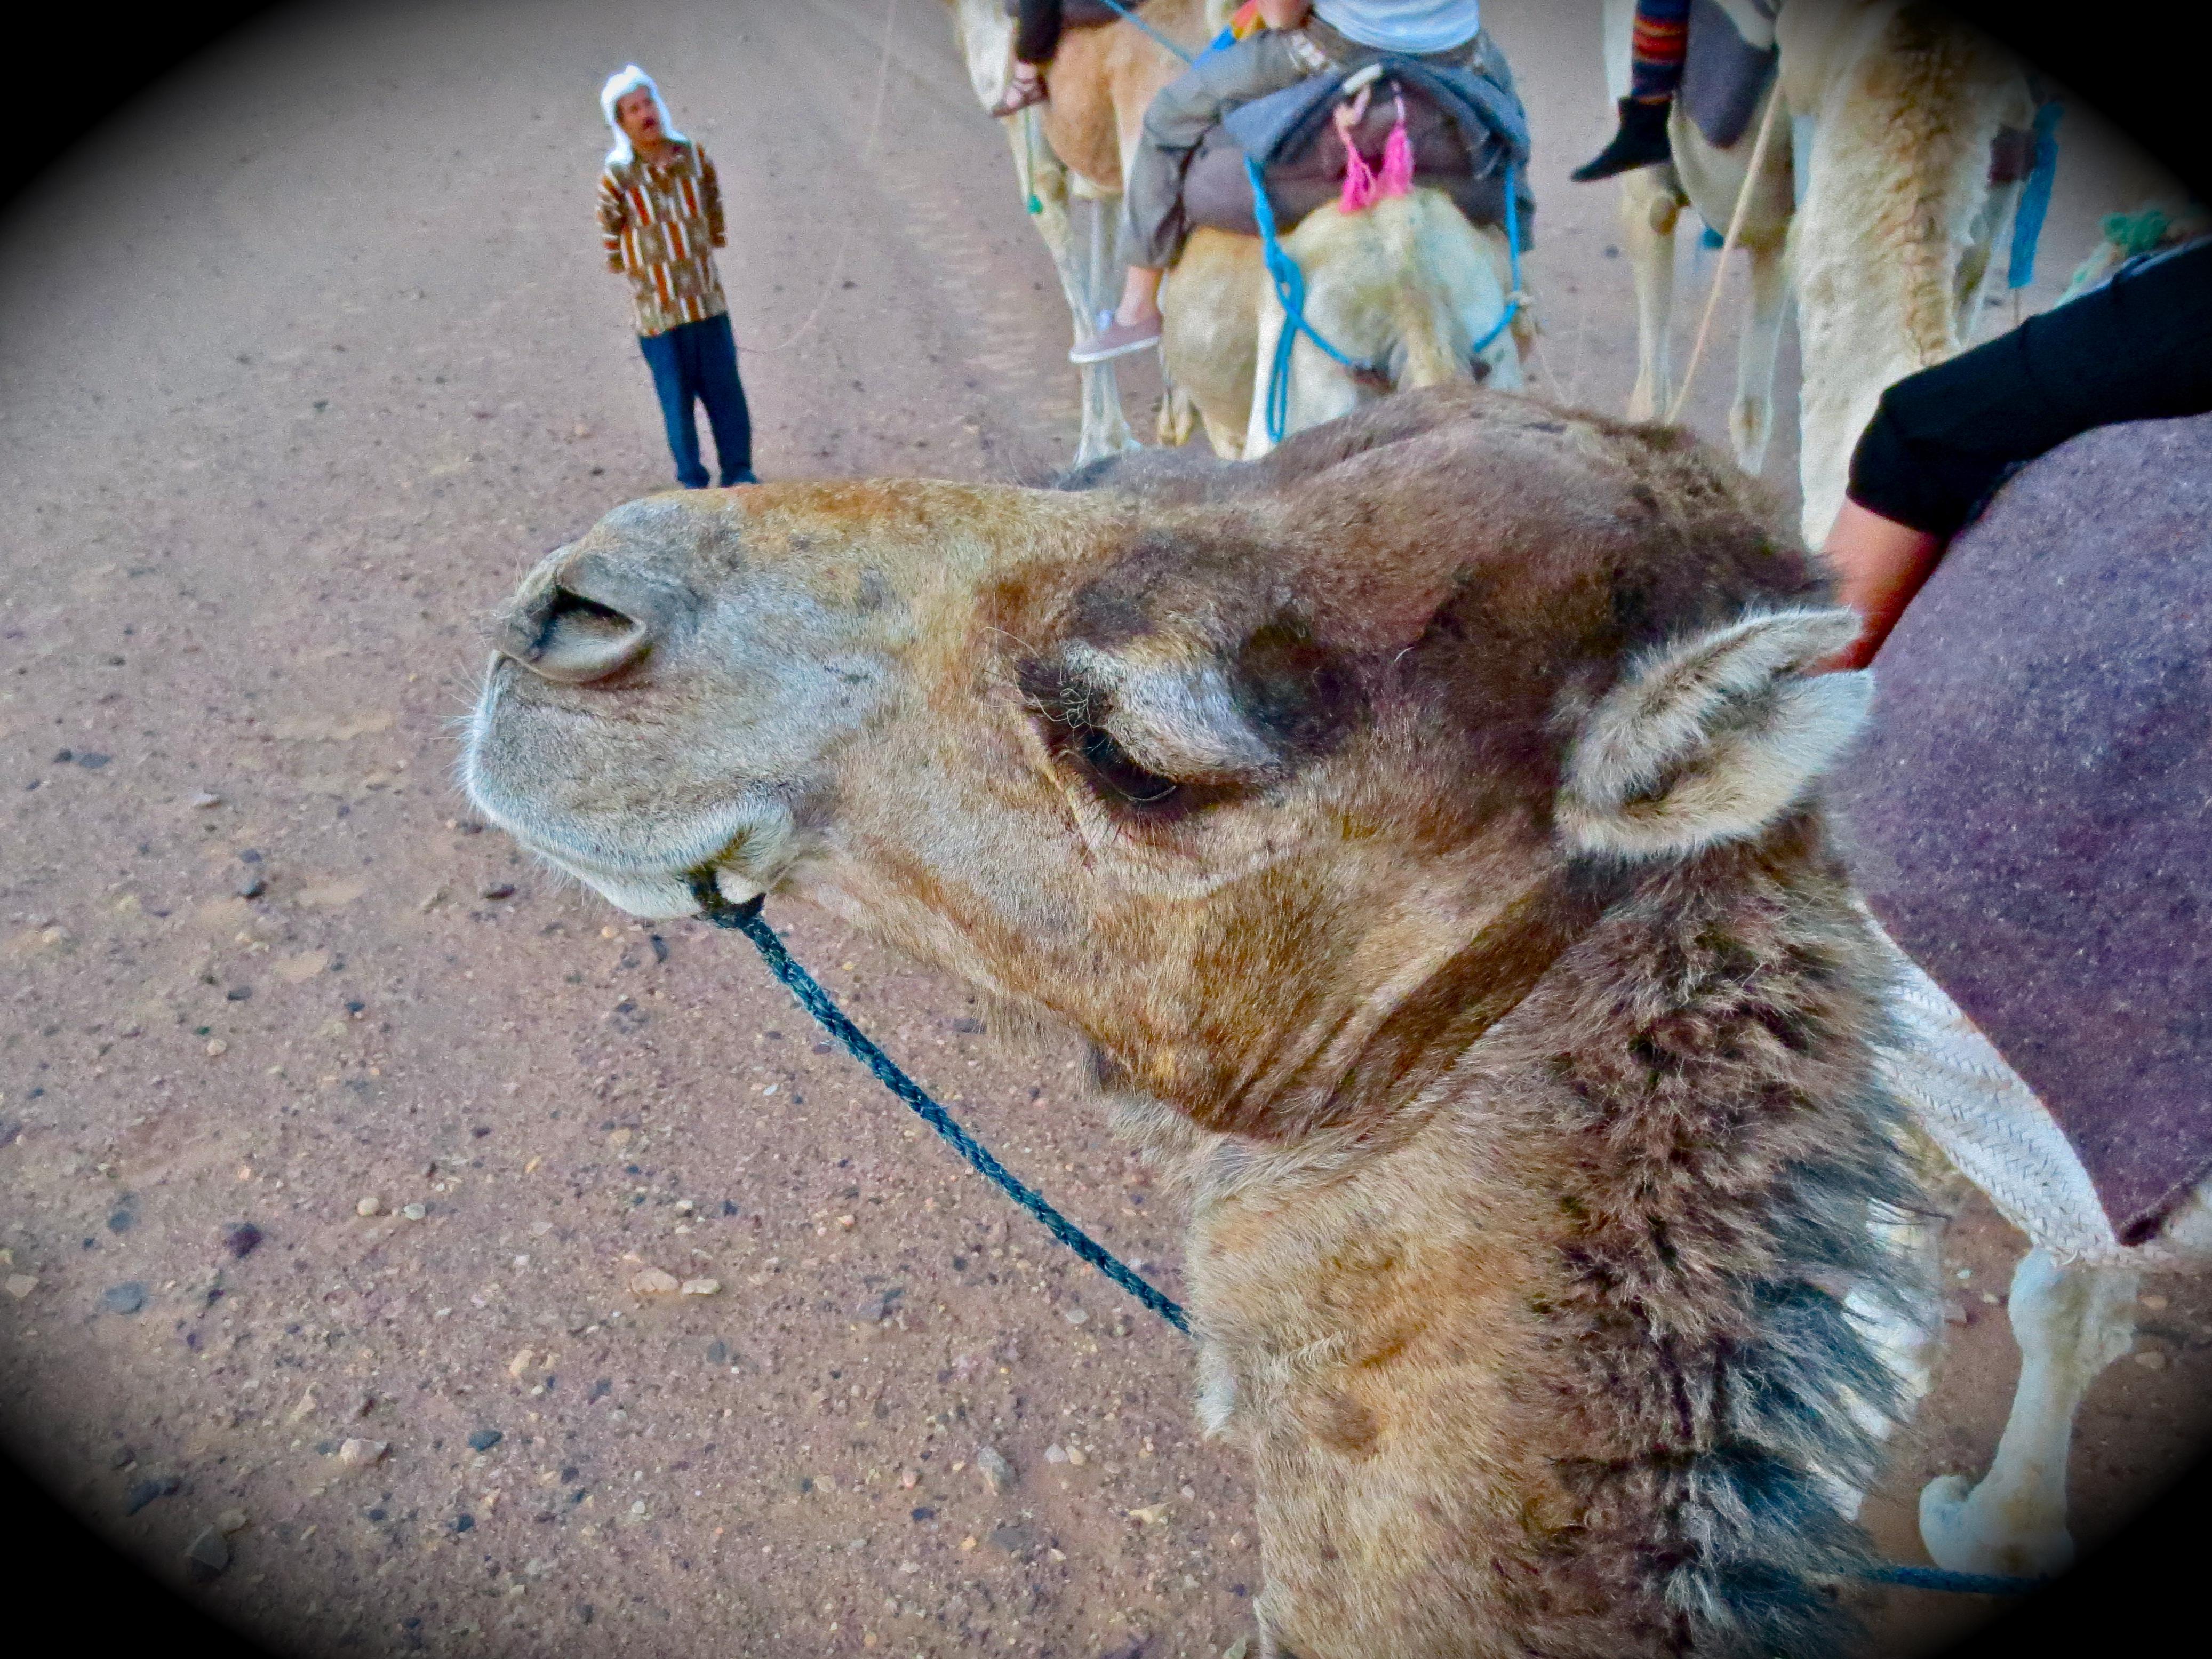 Chachi, the stubborn camel